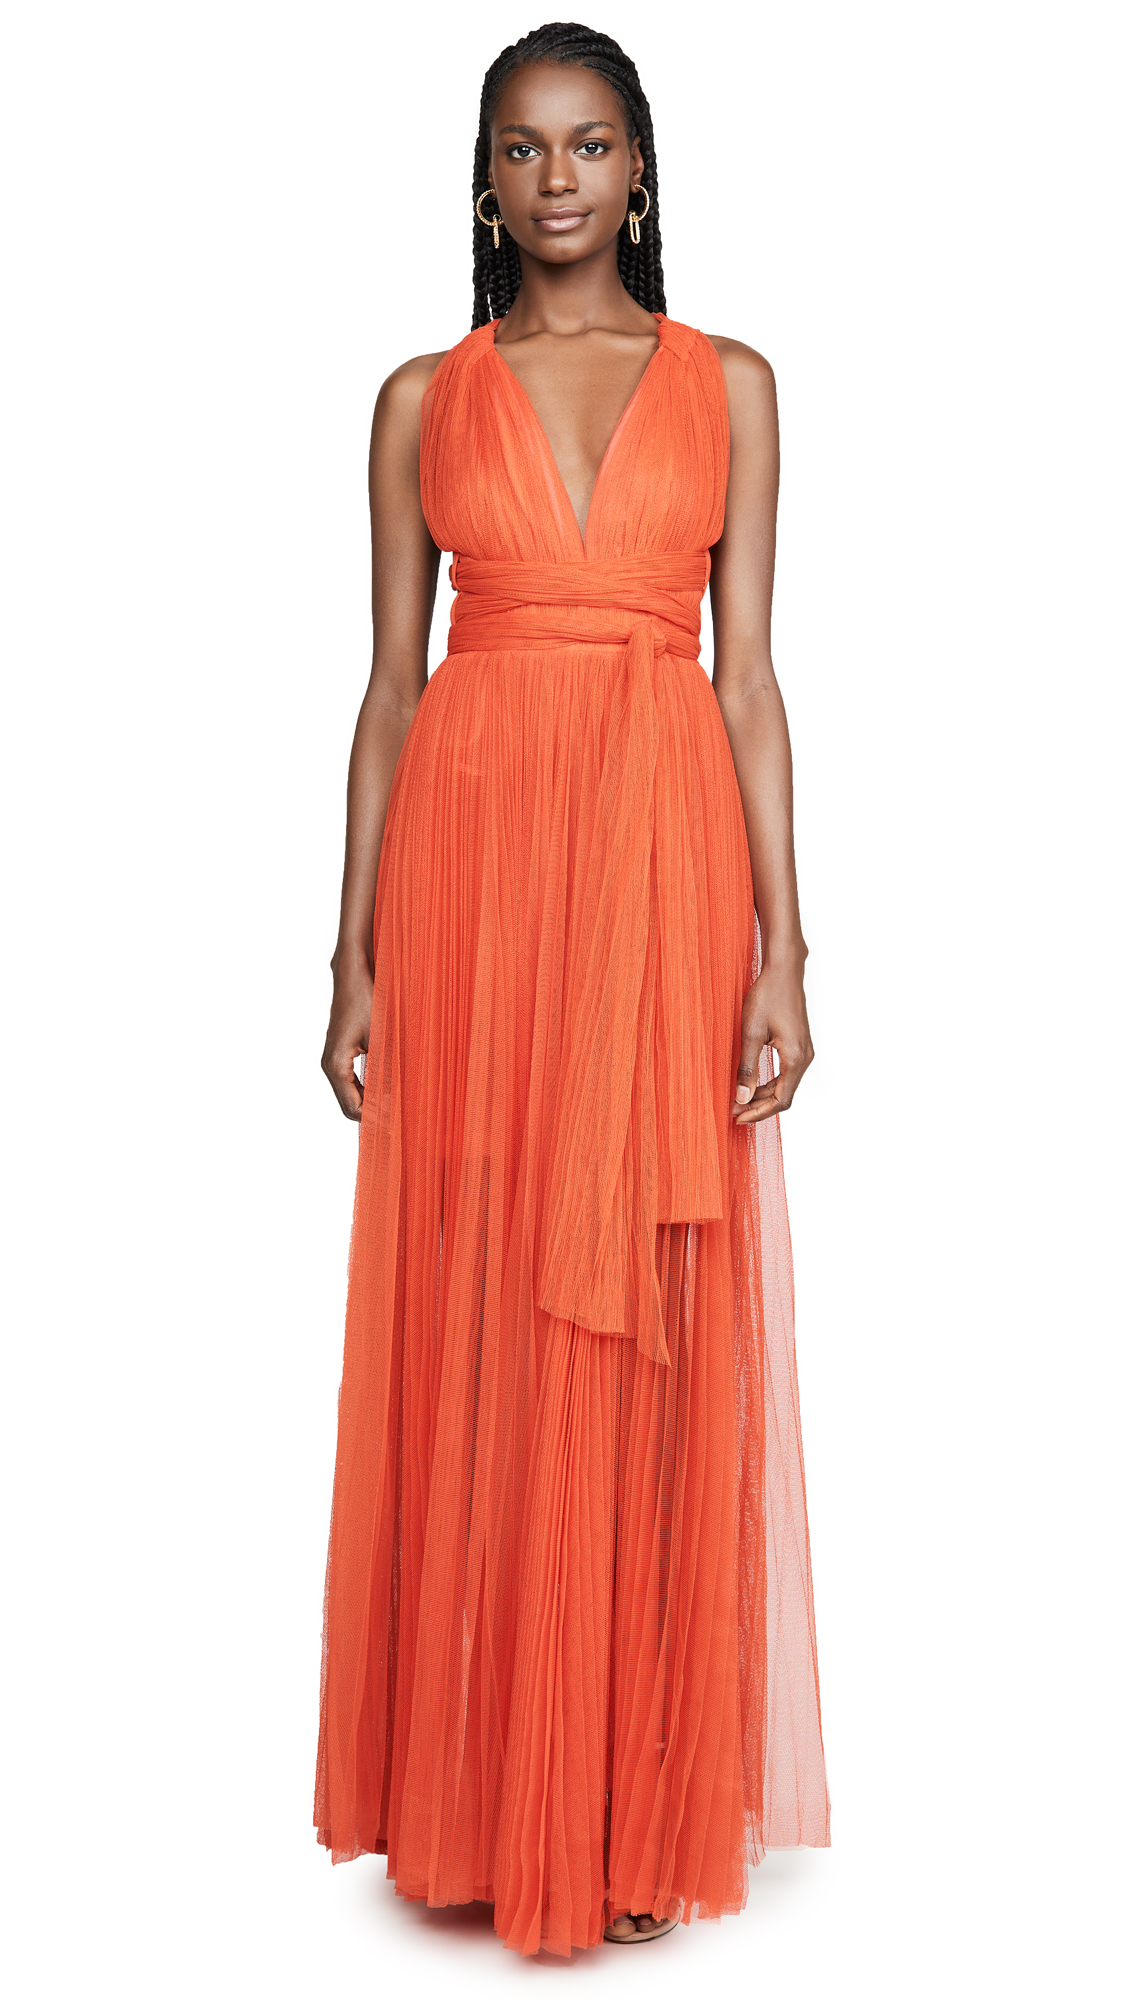 Maria Lucia Hohan Margo Maxi Dress - 60% Off Sale